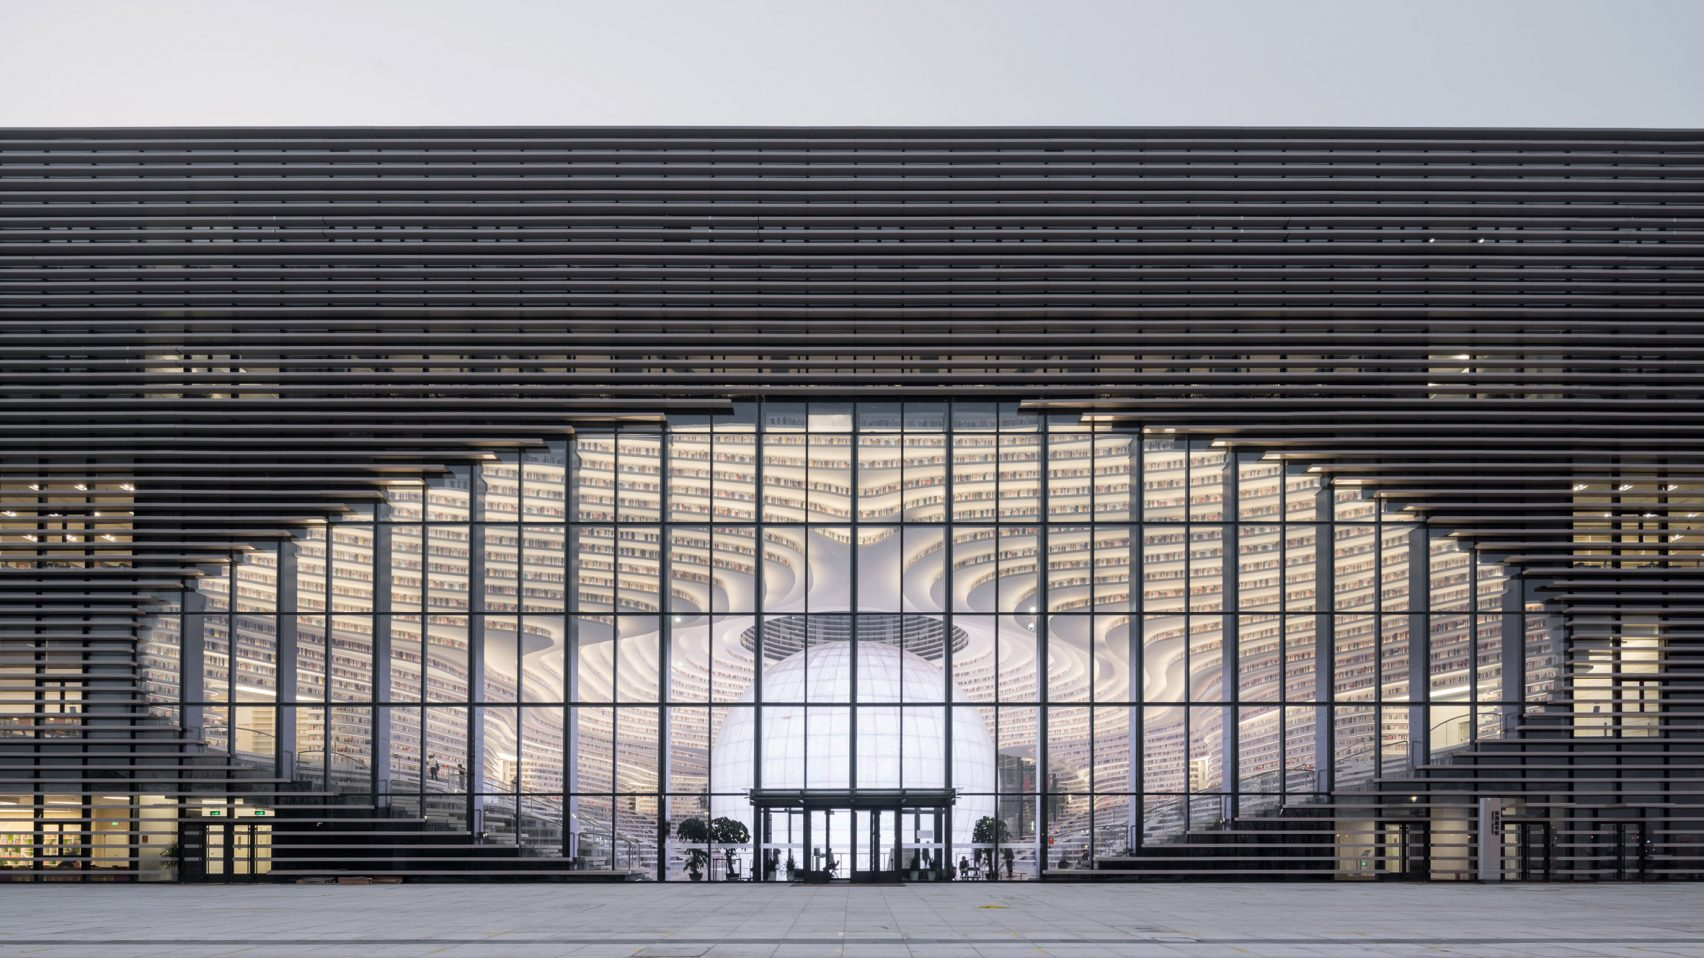 Biblioteca pública en Tianjin, China, de MVRDV